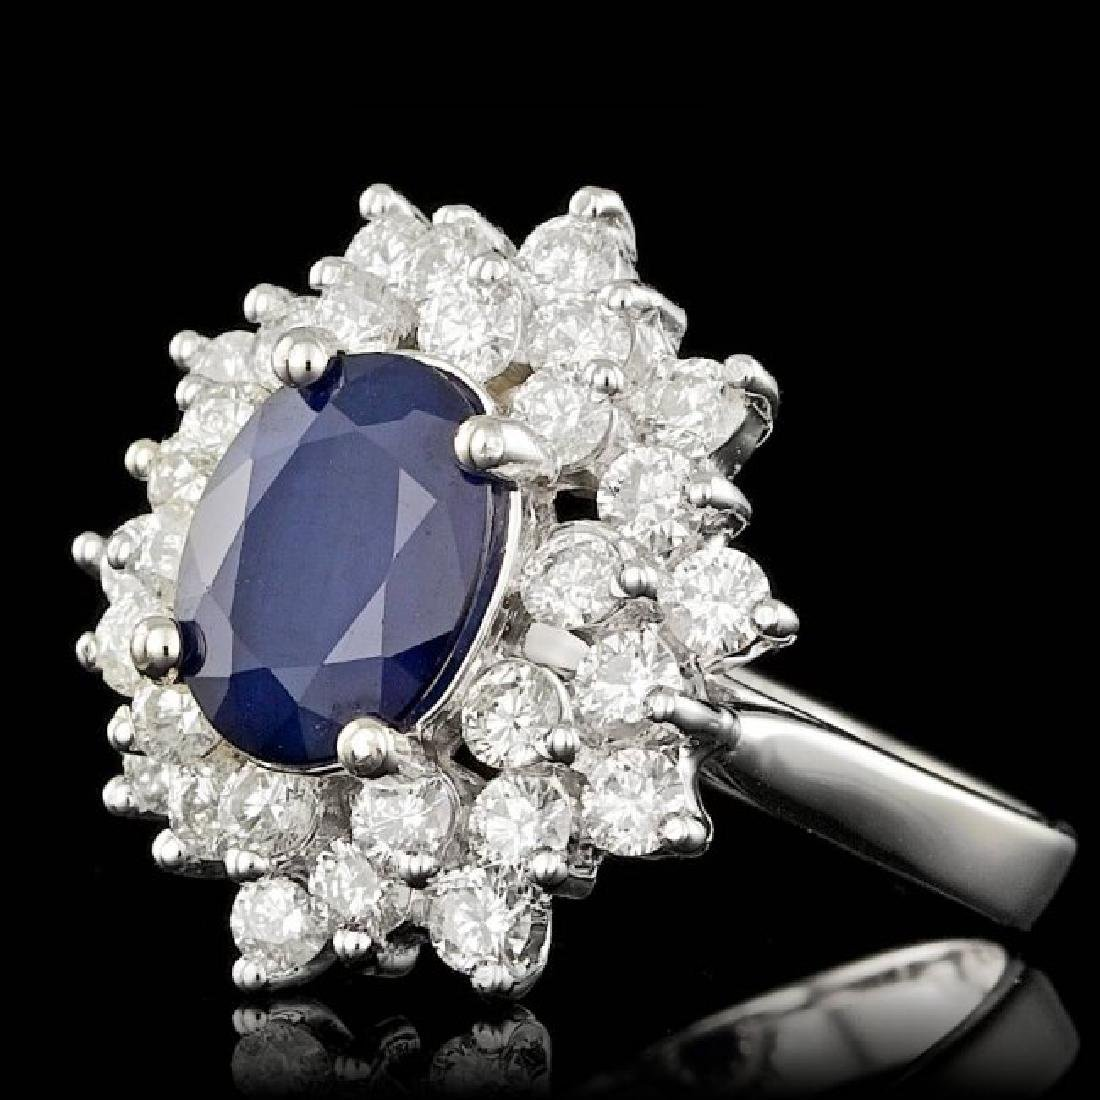 14k Gold 2.00ct Sapphire 1.45ct Diamond Ring - 2